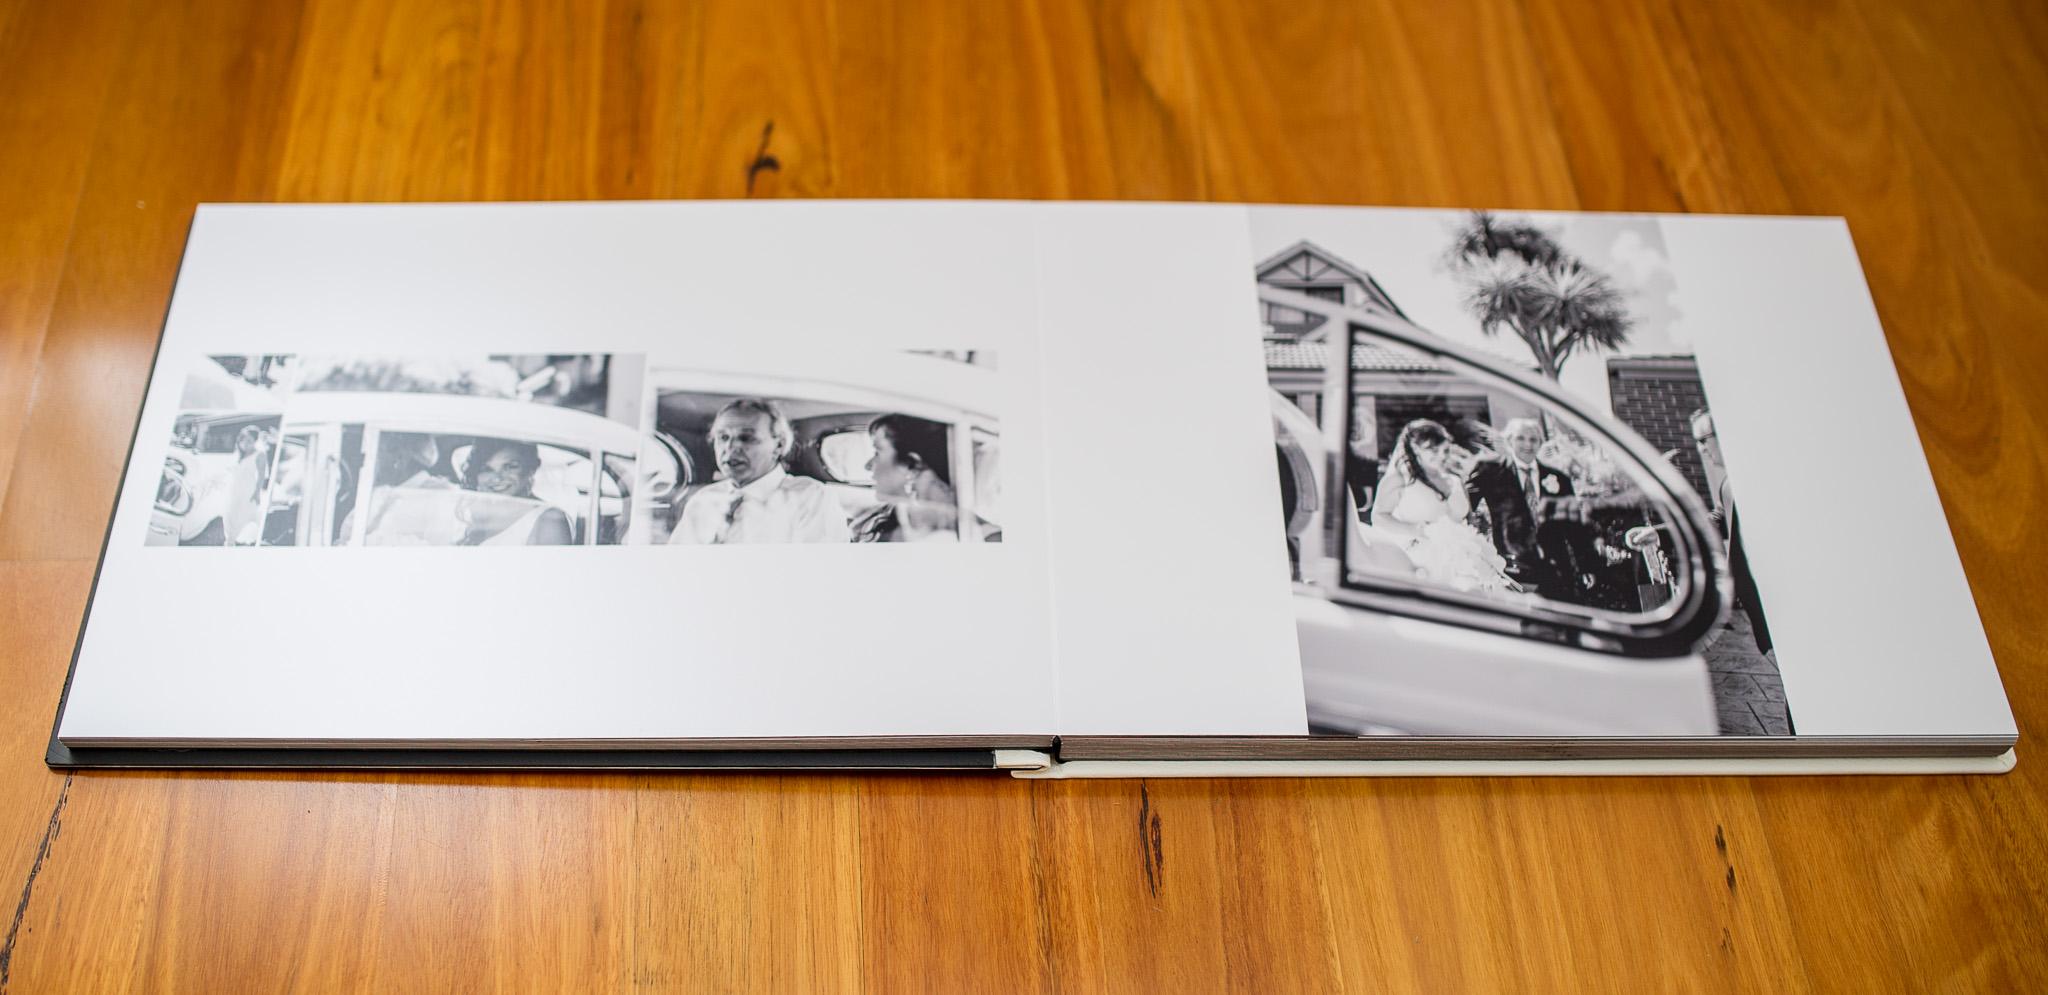 Sample-Album-Packshot-Potters-002.jpg